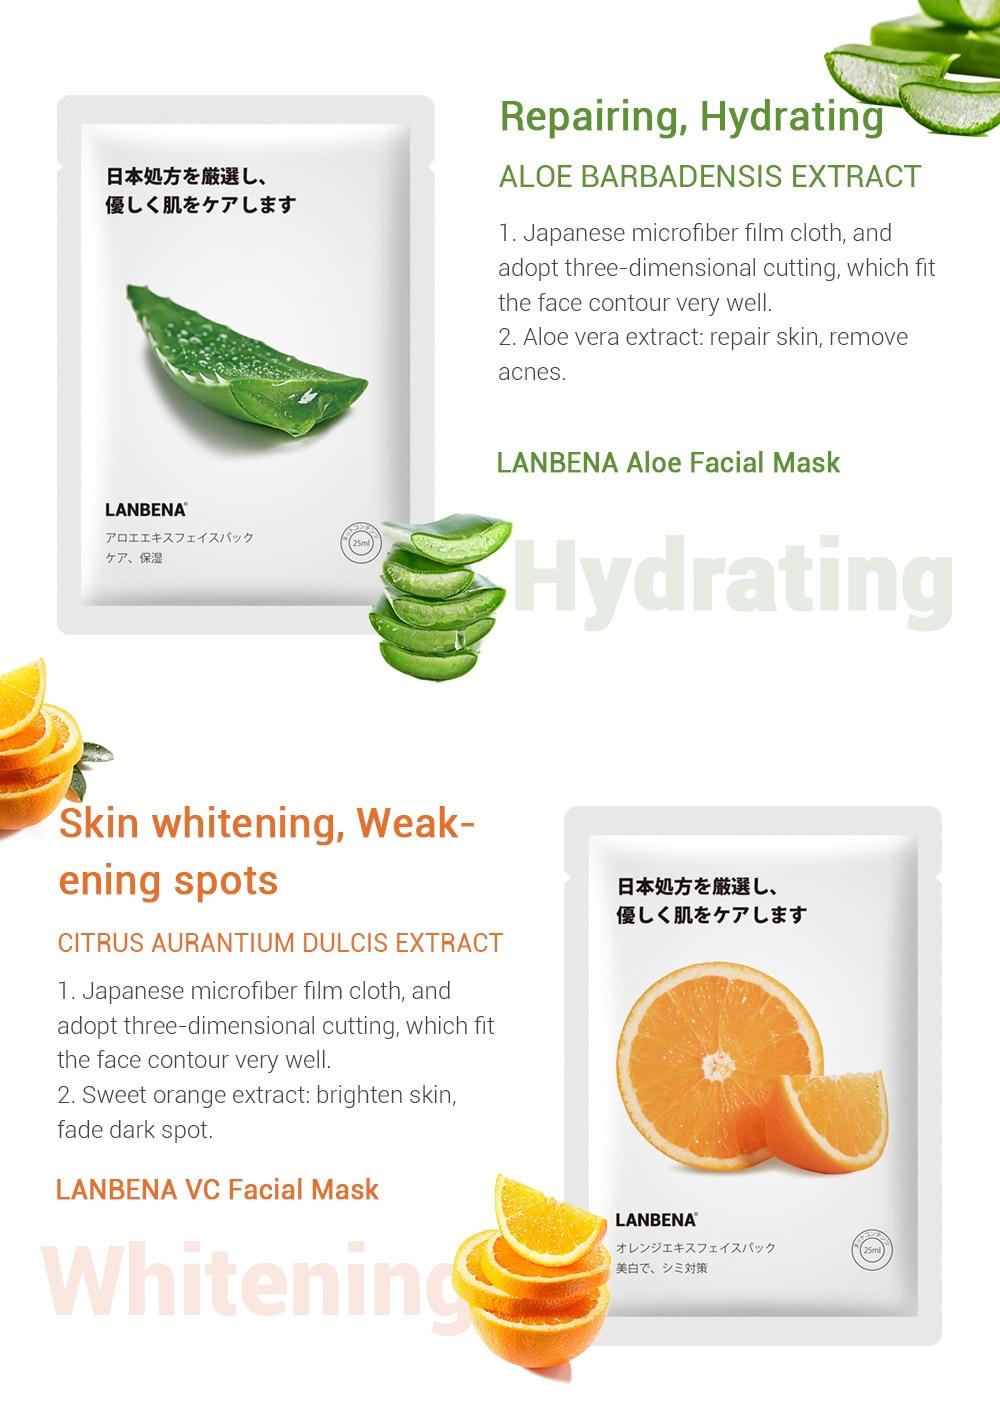 LANBENA Skin Care Face Mask Plant Facial Moisturizing Serum Fruit Blackhead Remover Essence Whitening Anti Aging Beauty Makeup